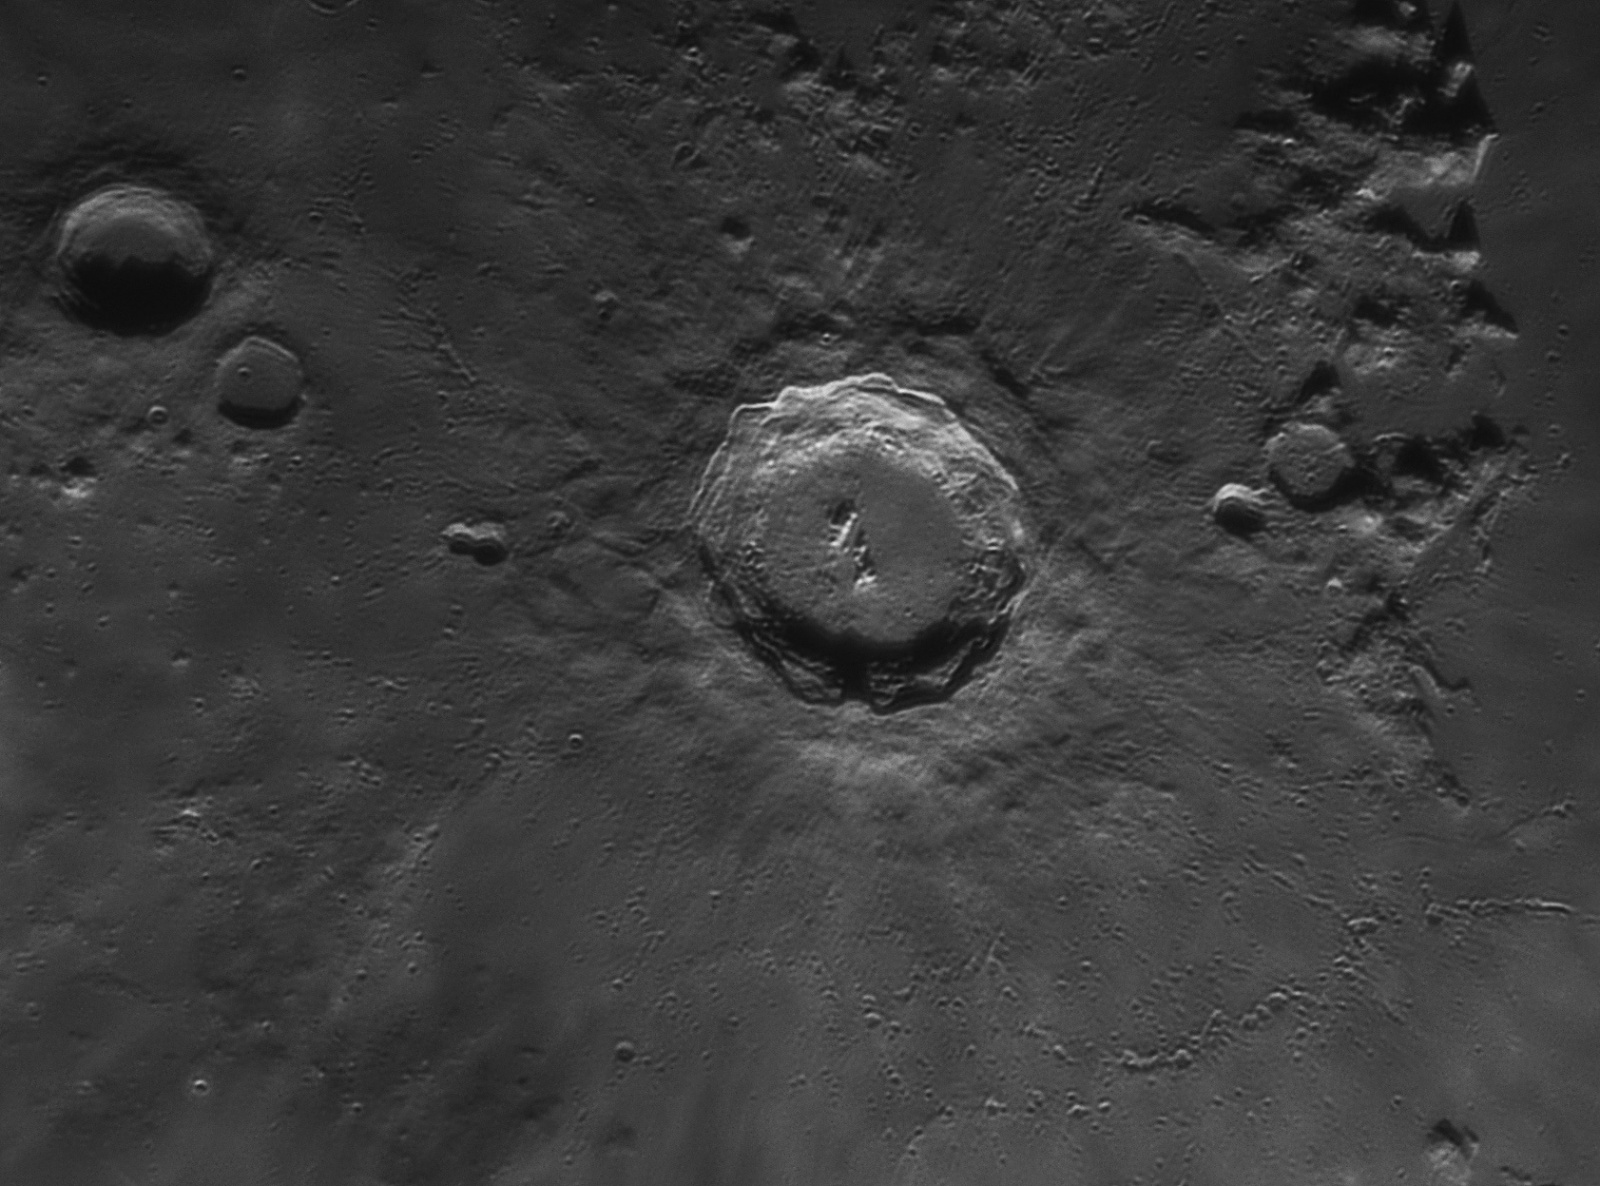 Kopernik.thumb.jpg.bf21dd0edb24766856b8d9f73e36da35.jpg